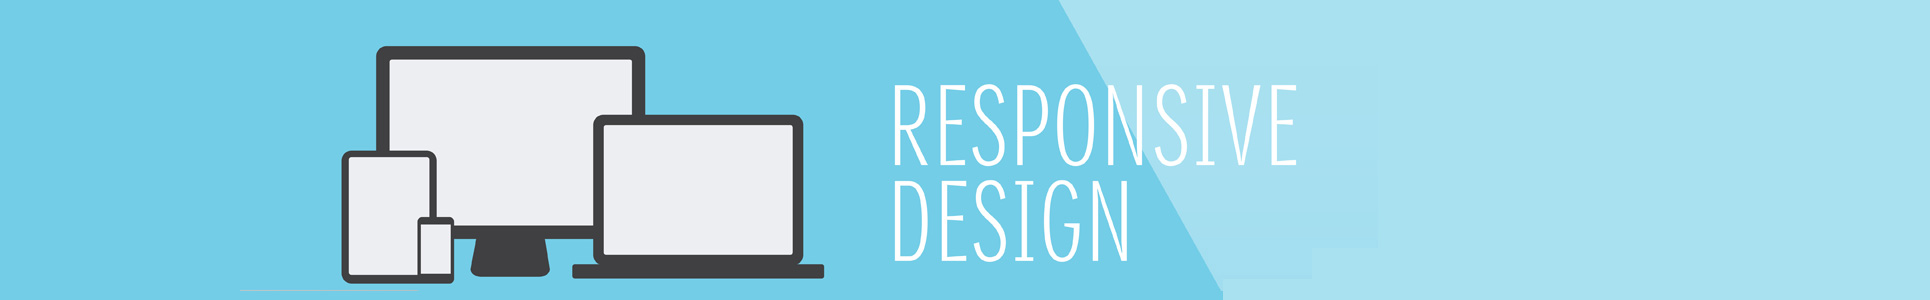 Responsive Design Banner